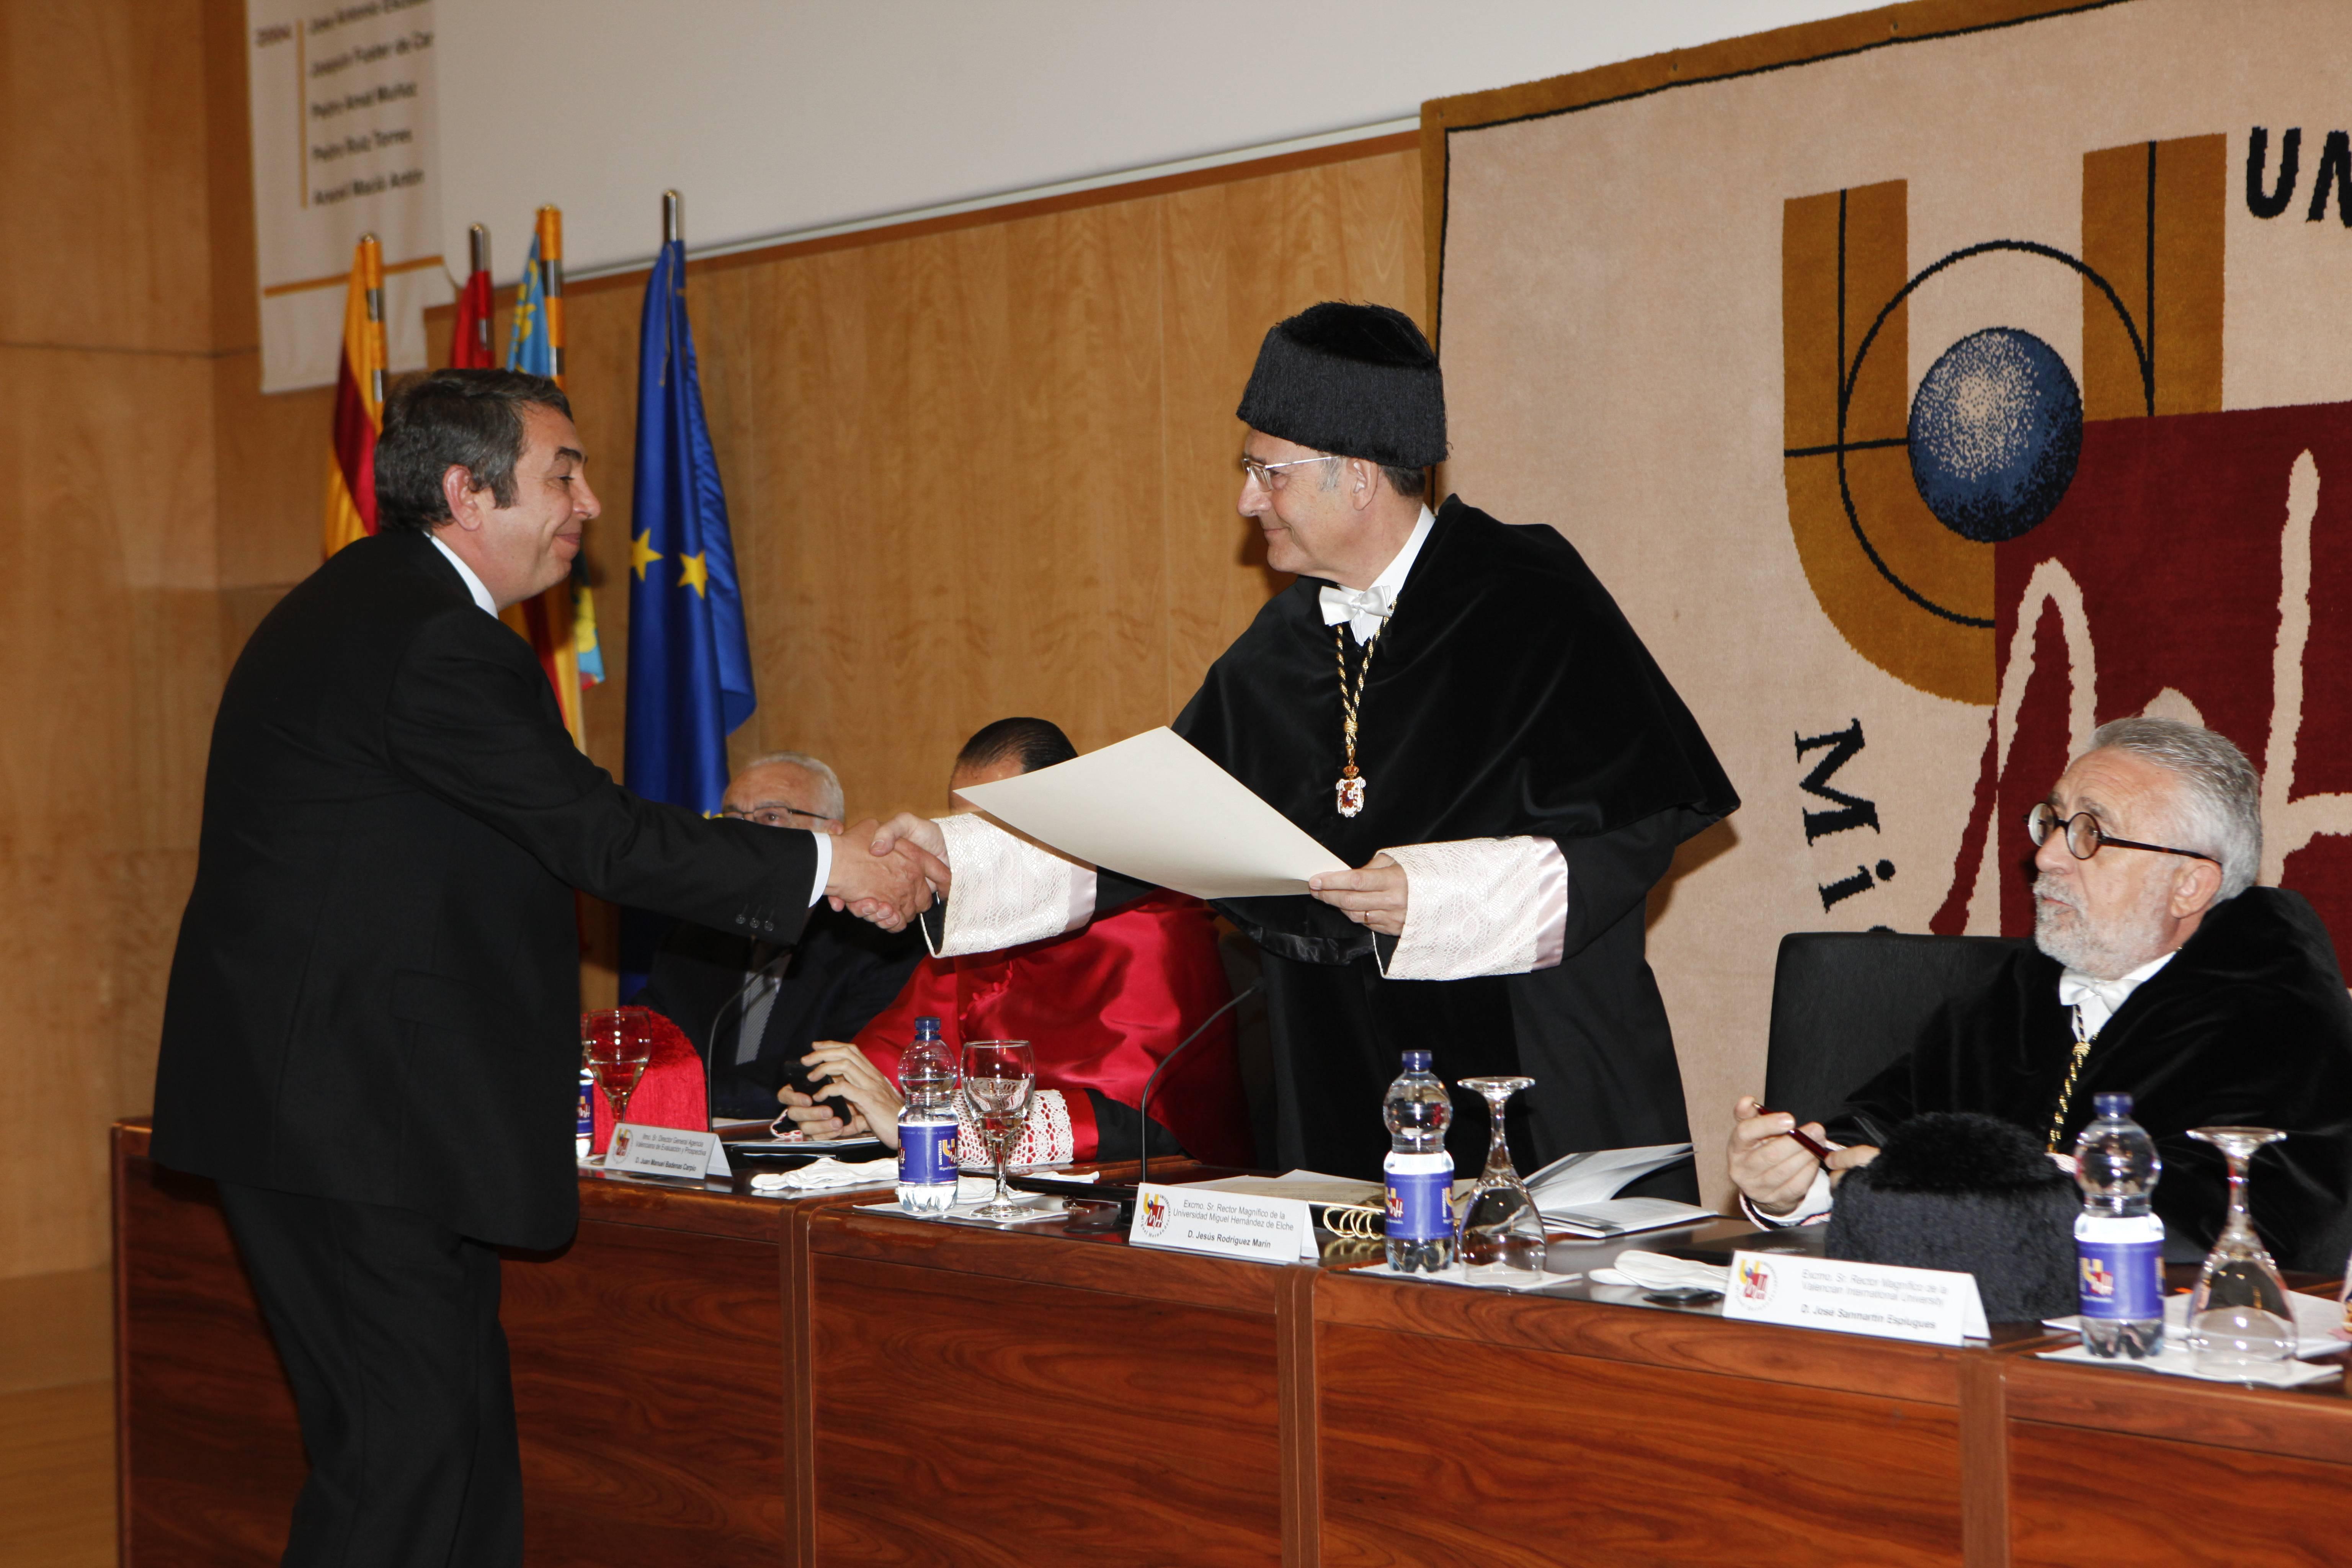 doctor-honoris-causa-luis-gamir_mg_0932.jpg